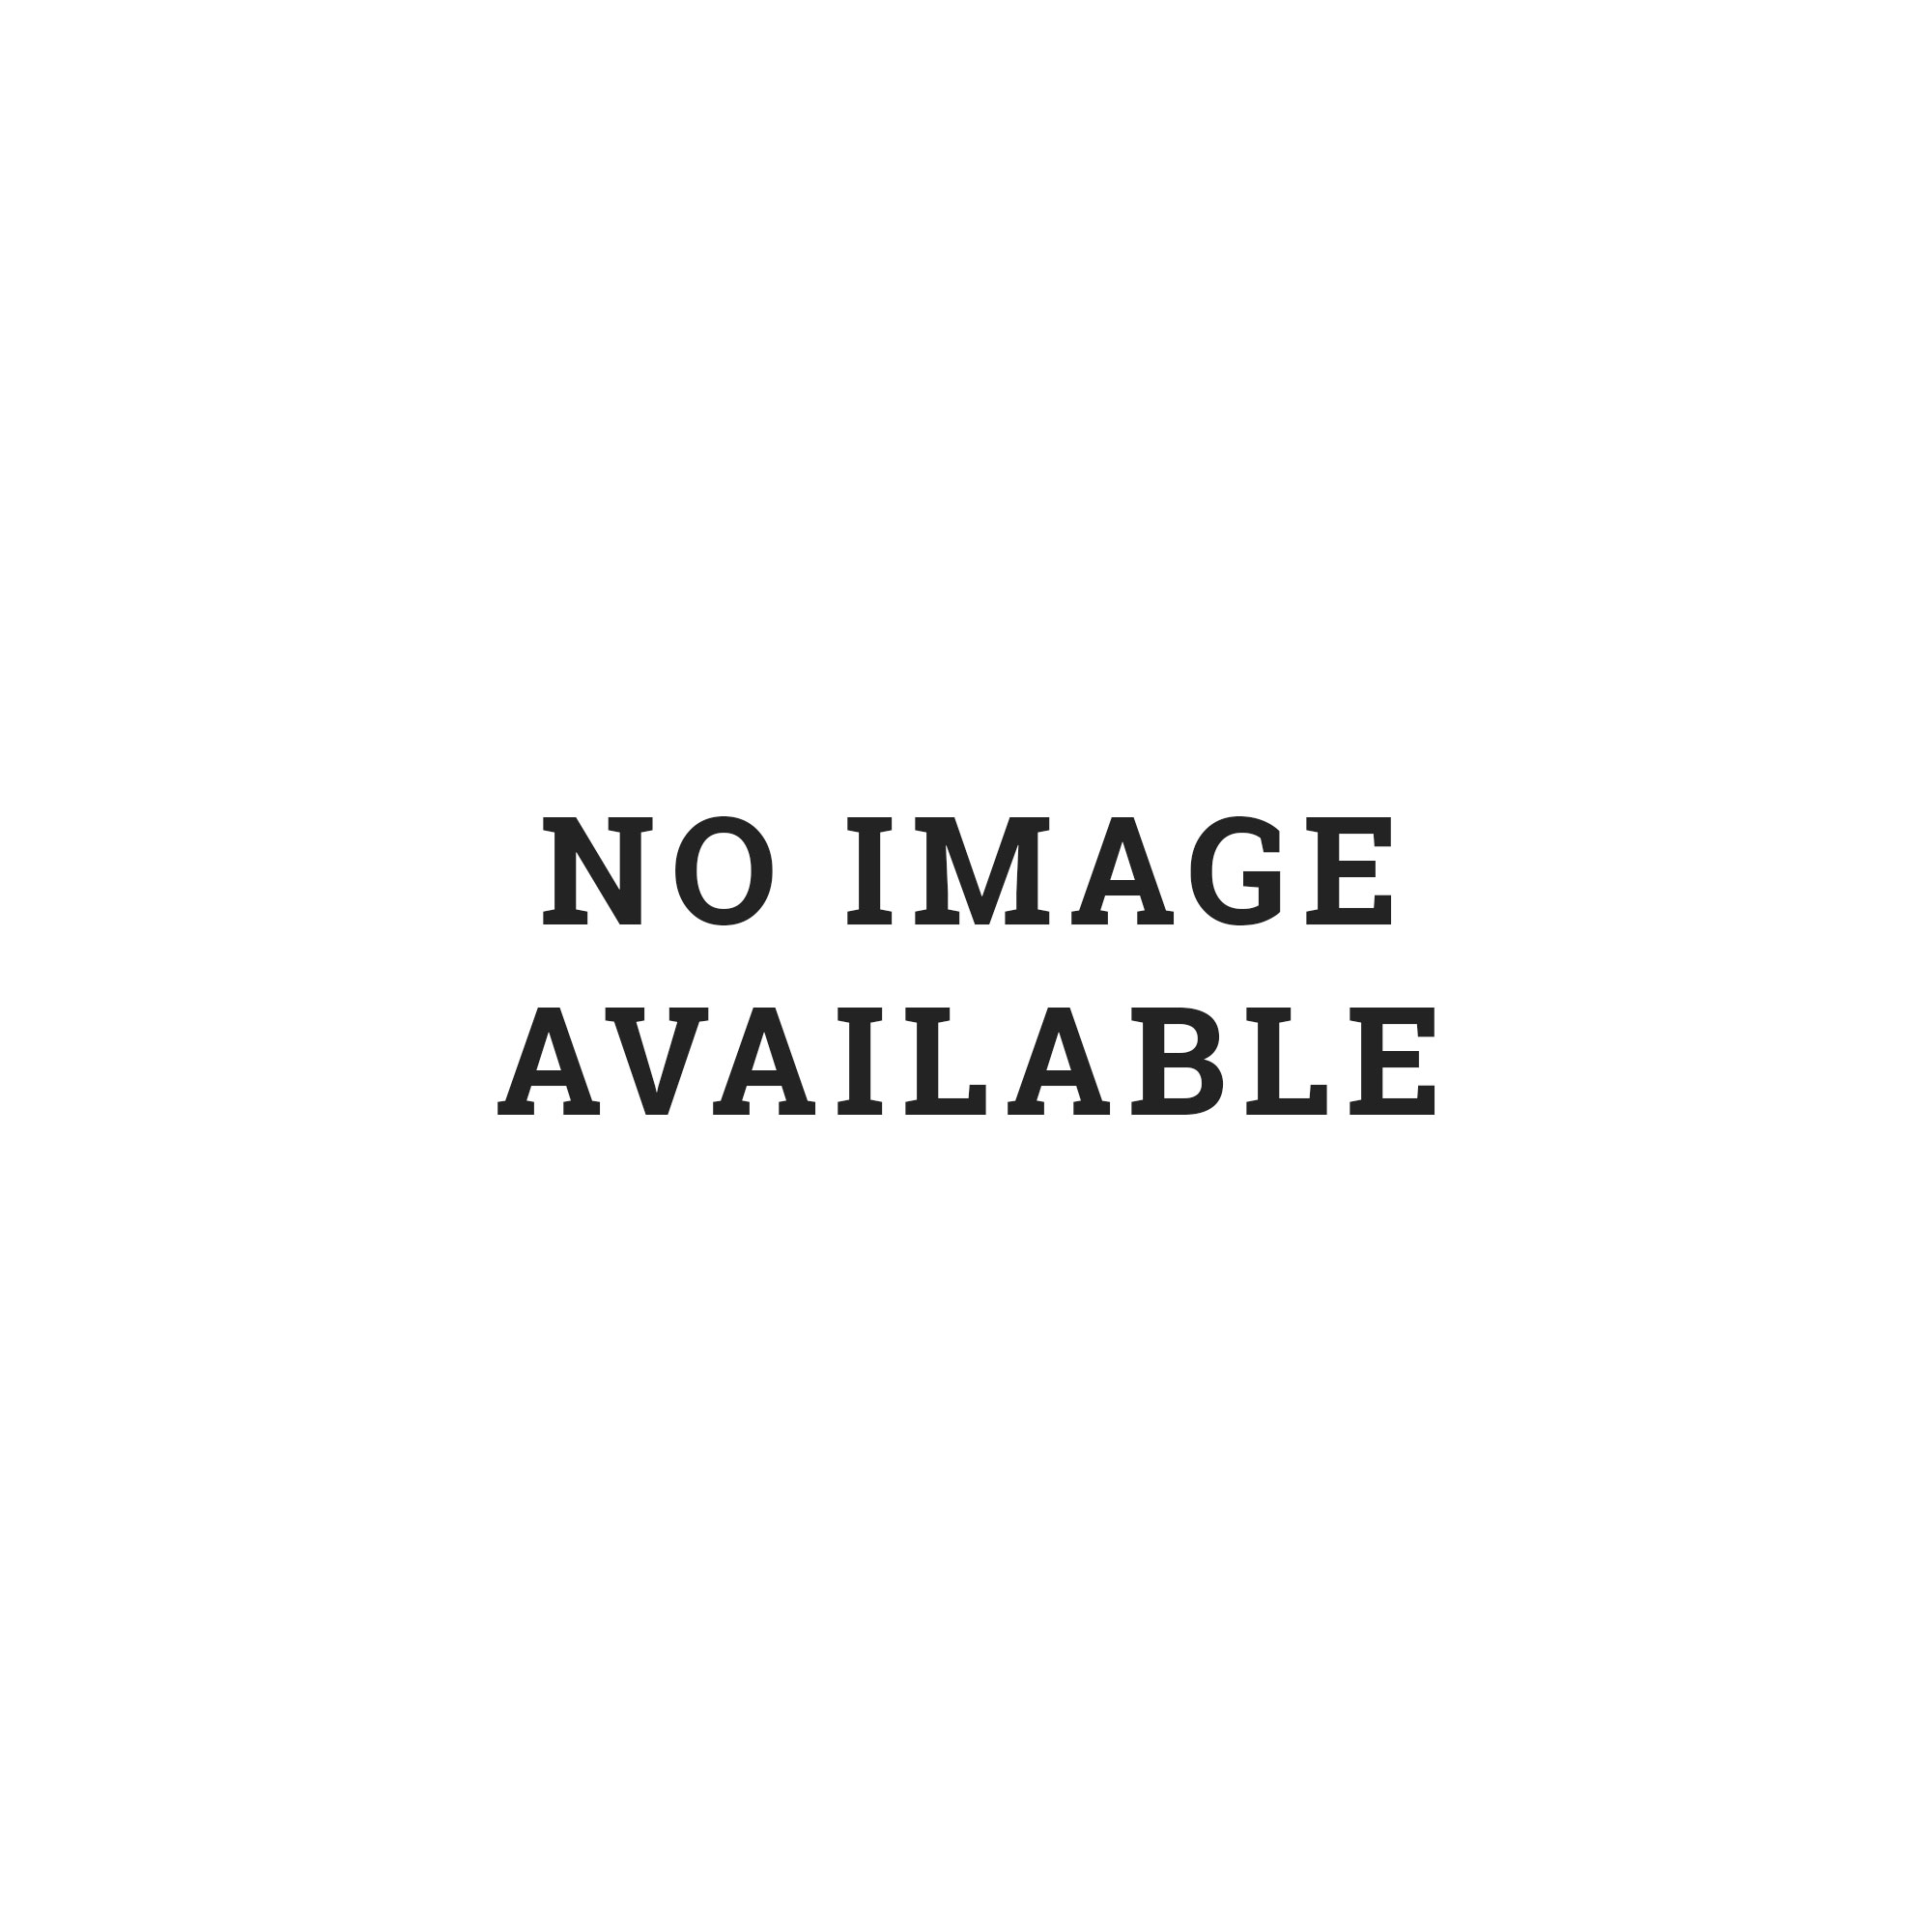 Dr Martens 1460 Vegan Womens 8-Eyelet Boots - Hot Pink